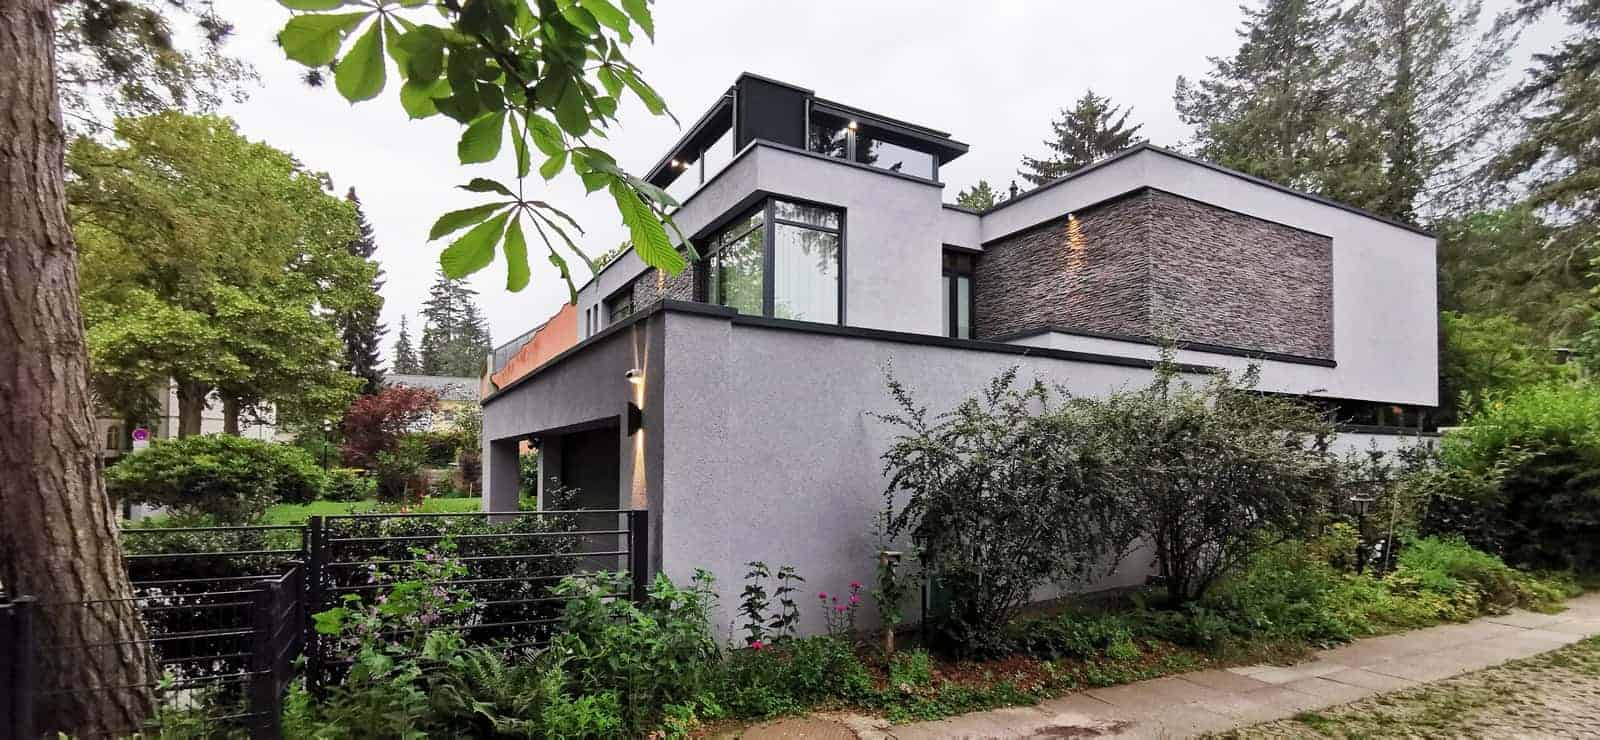 Villa am Wald Potsdam